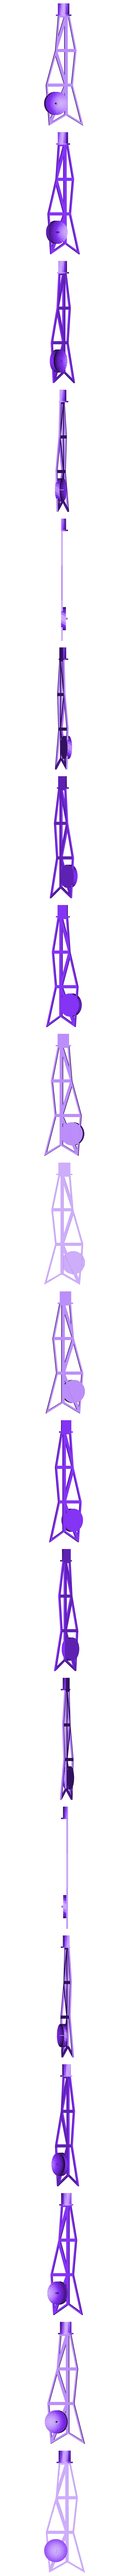 Mariner_Antenna.stl Download free STL file Mariner • 3D printable object, Slagerqod